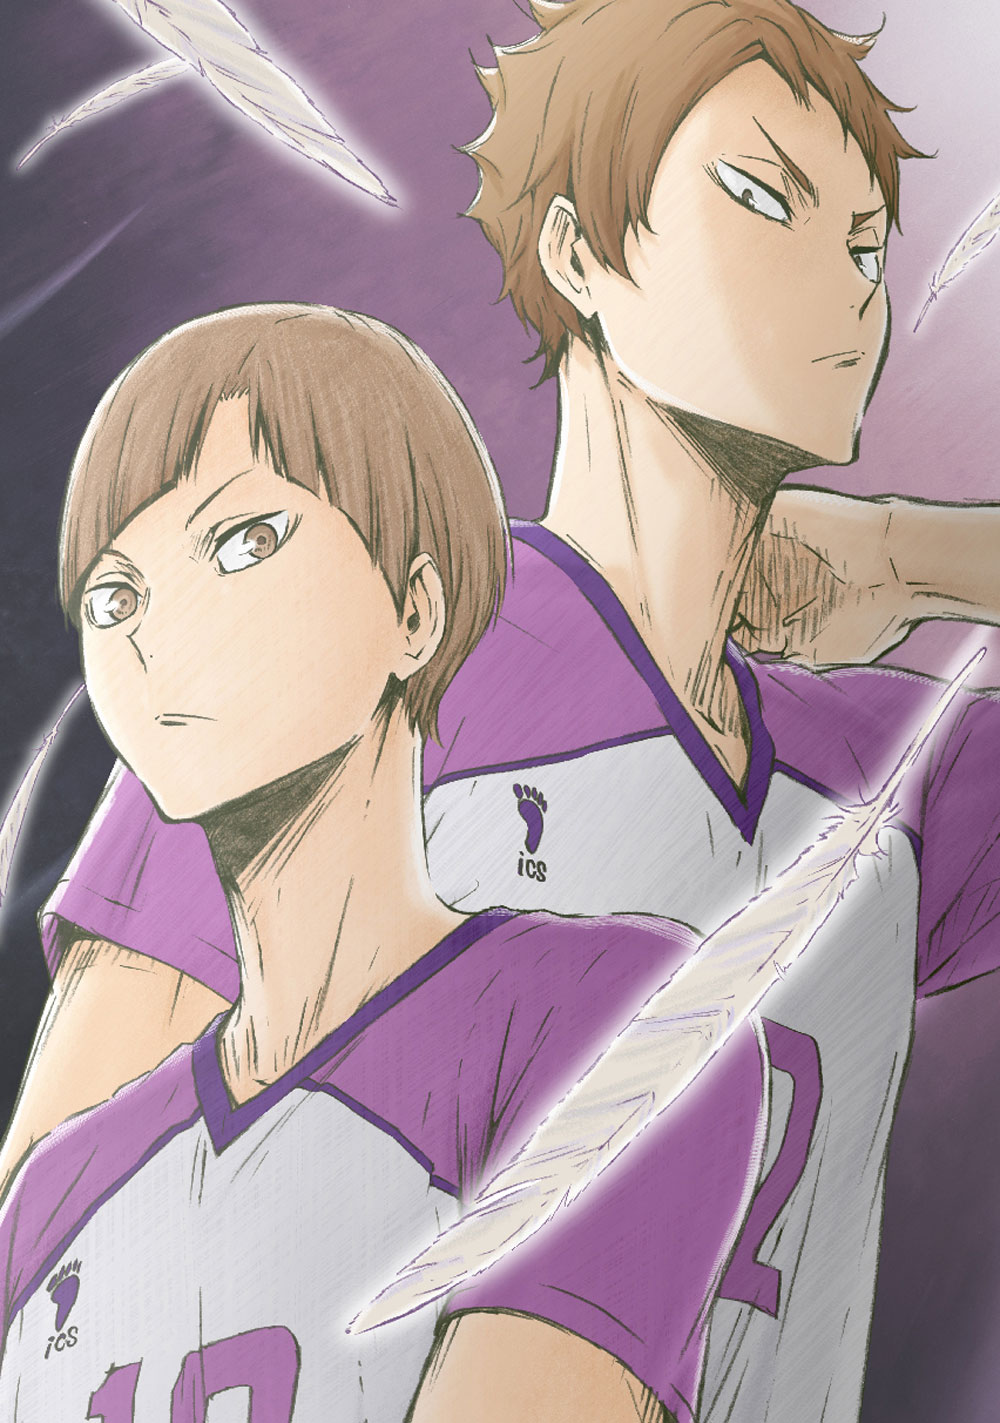 ハイキュー!! 烏野高校 VS 白鳥沢学園高校 Vol.5 DVD 初回限定版